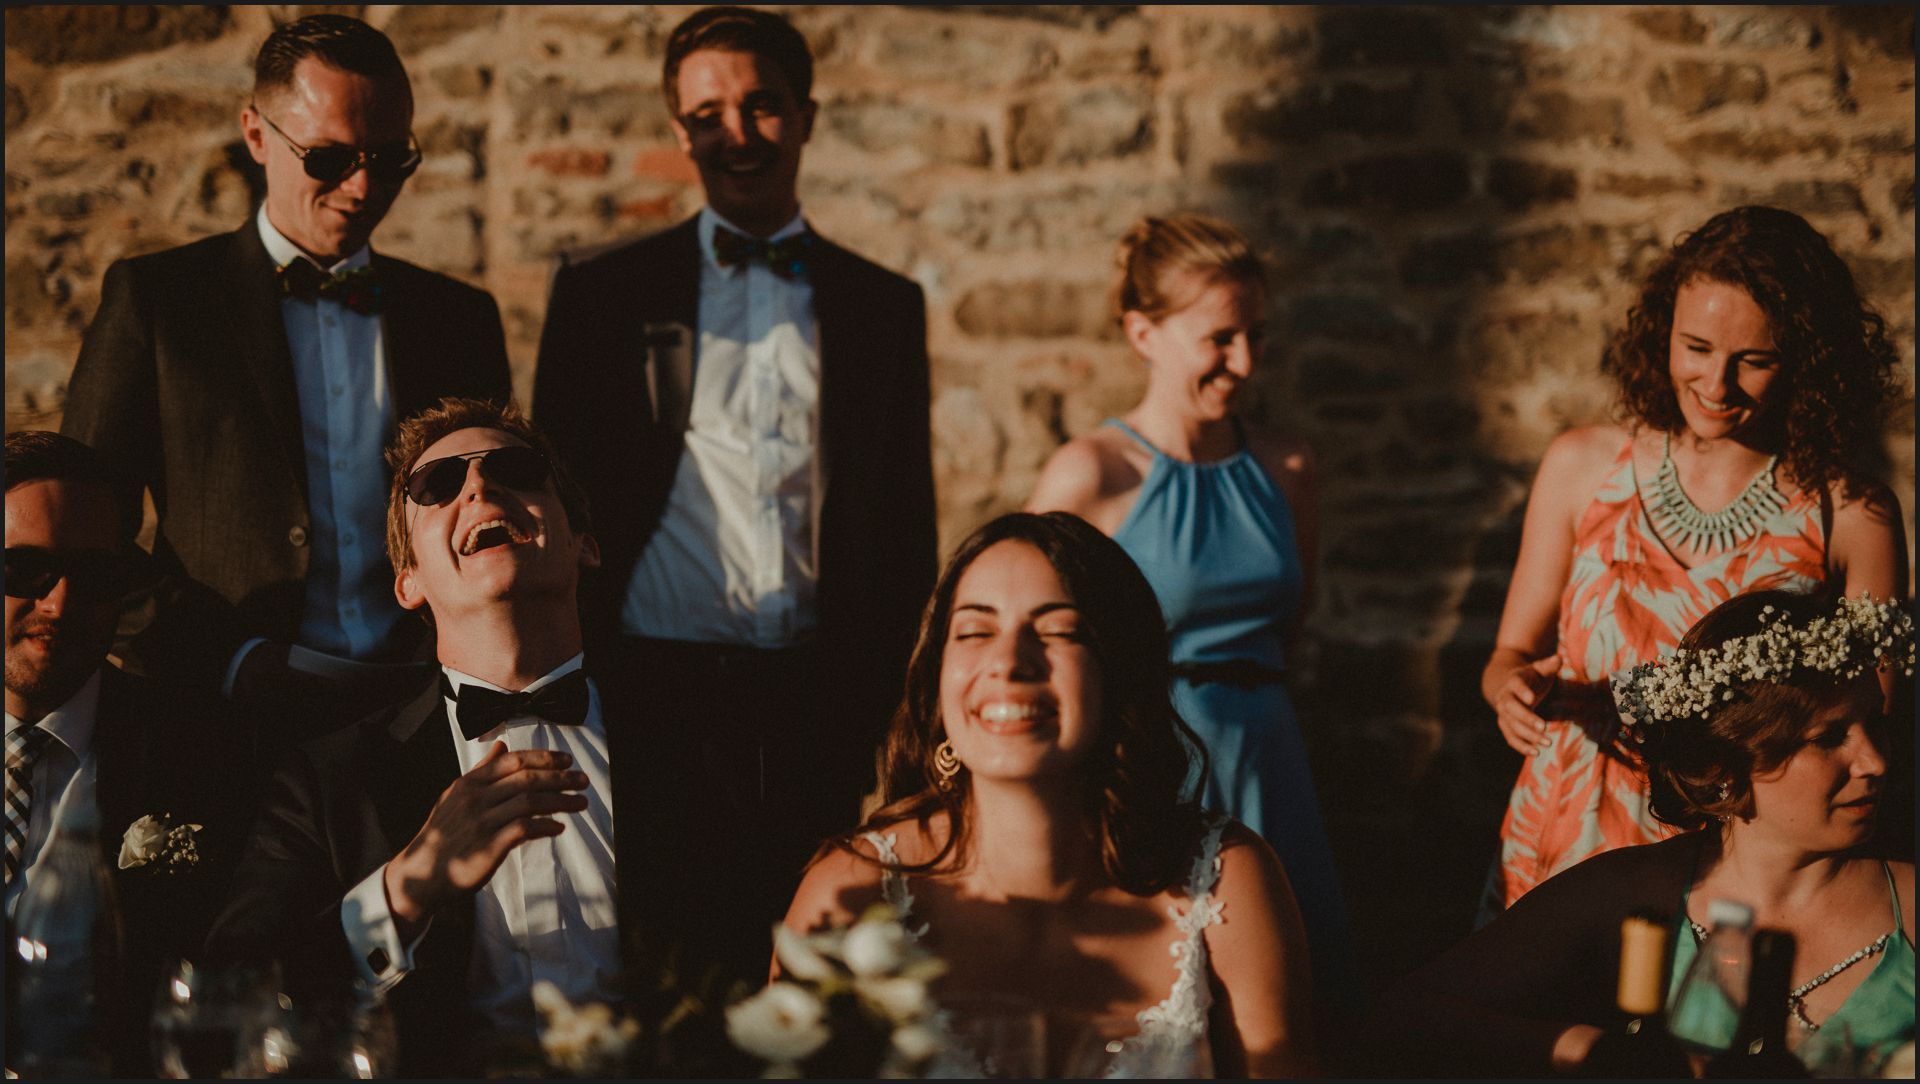 bride, groom, wedding, umbria, nikis resort, dinner, funny, smile